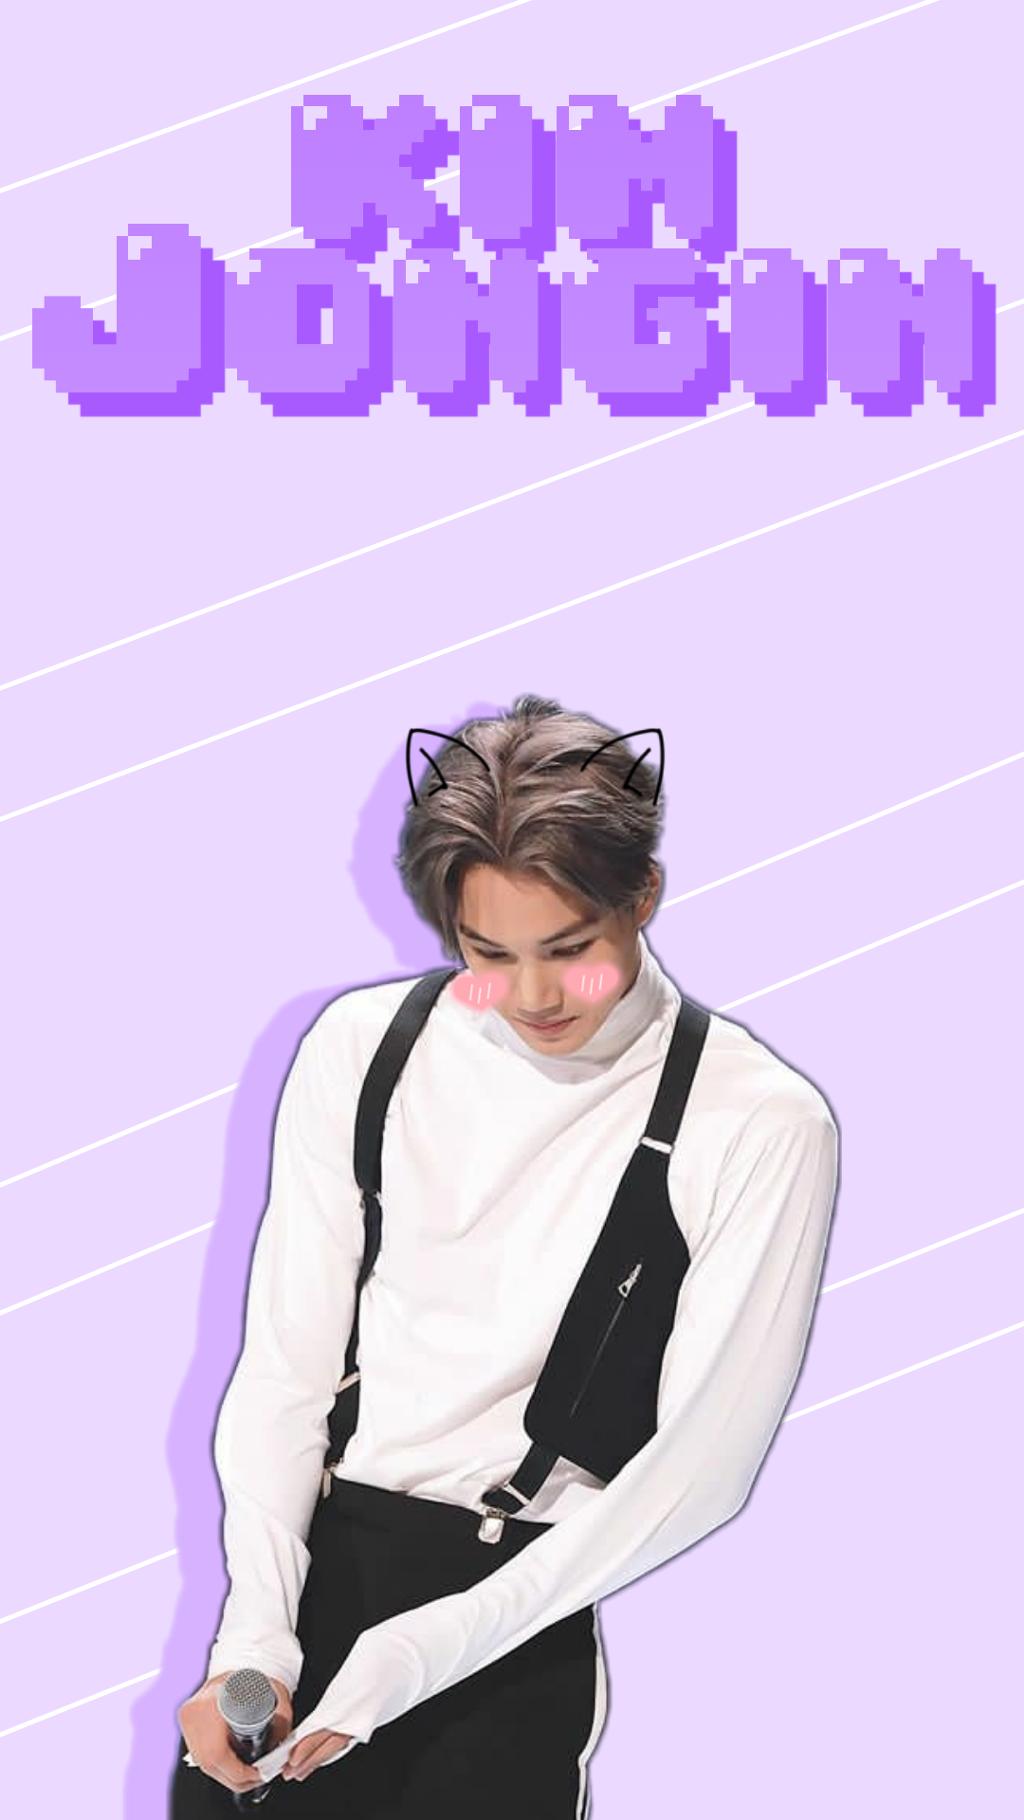 Exo Kai Wallpaper Posted By Samantha Cunningham